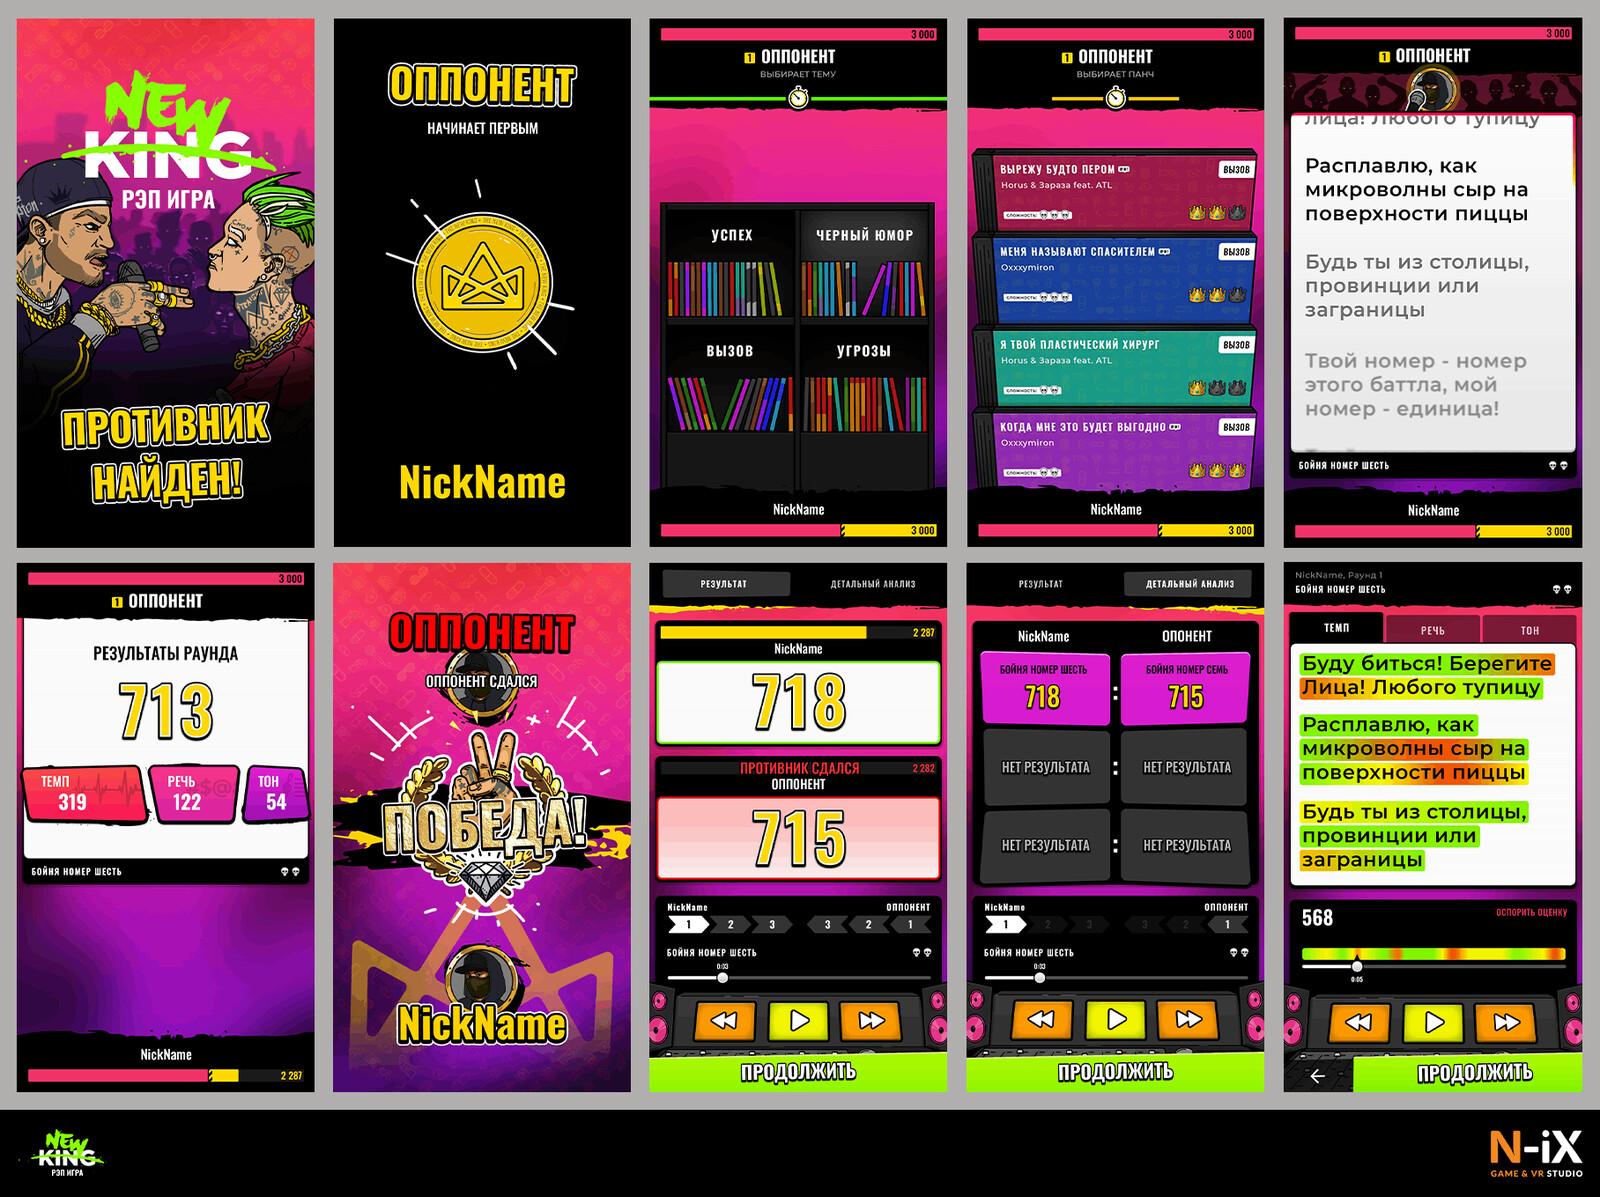 The New King v.2 UI screens